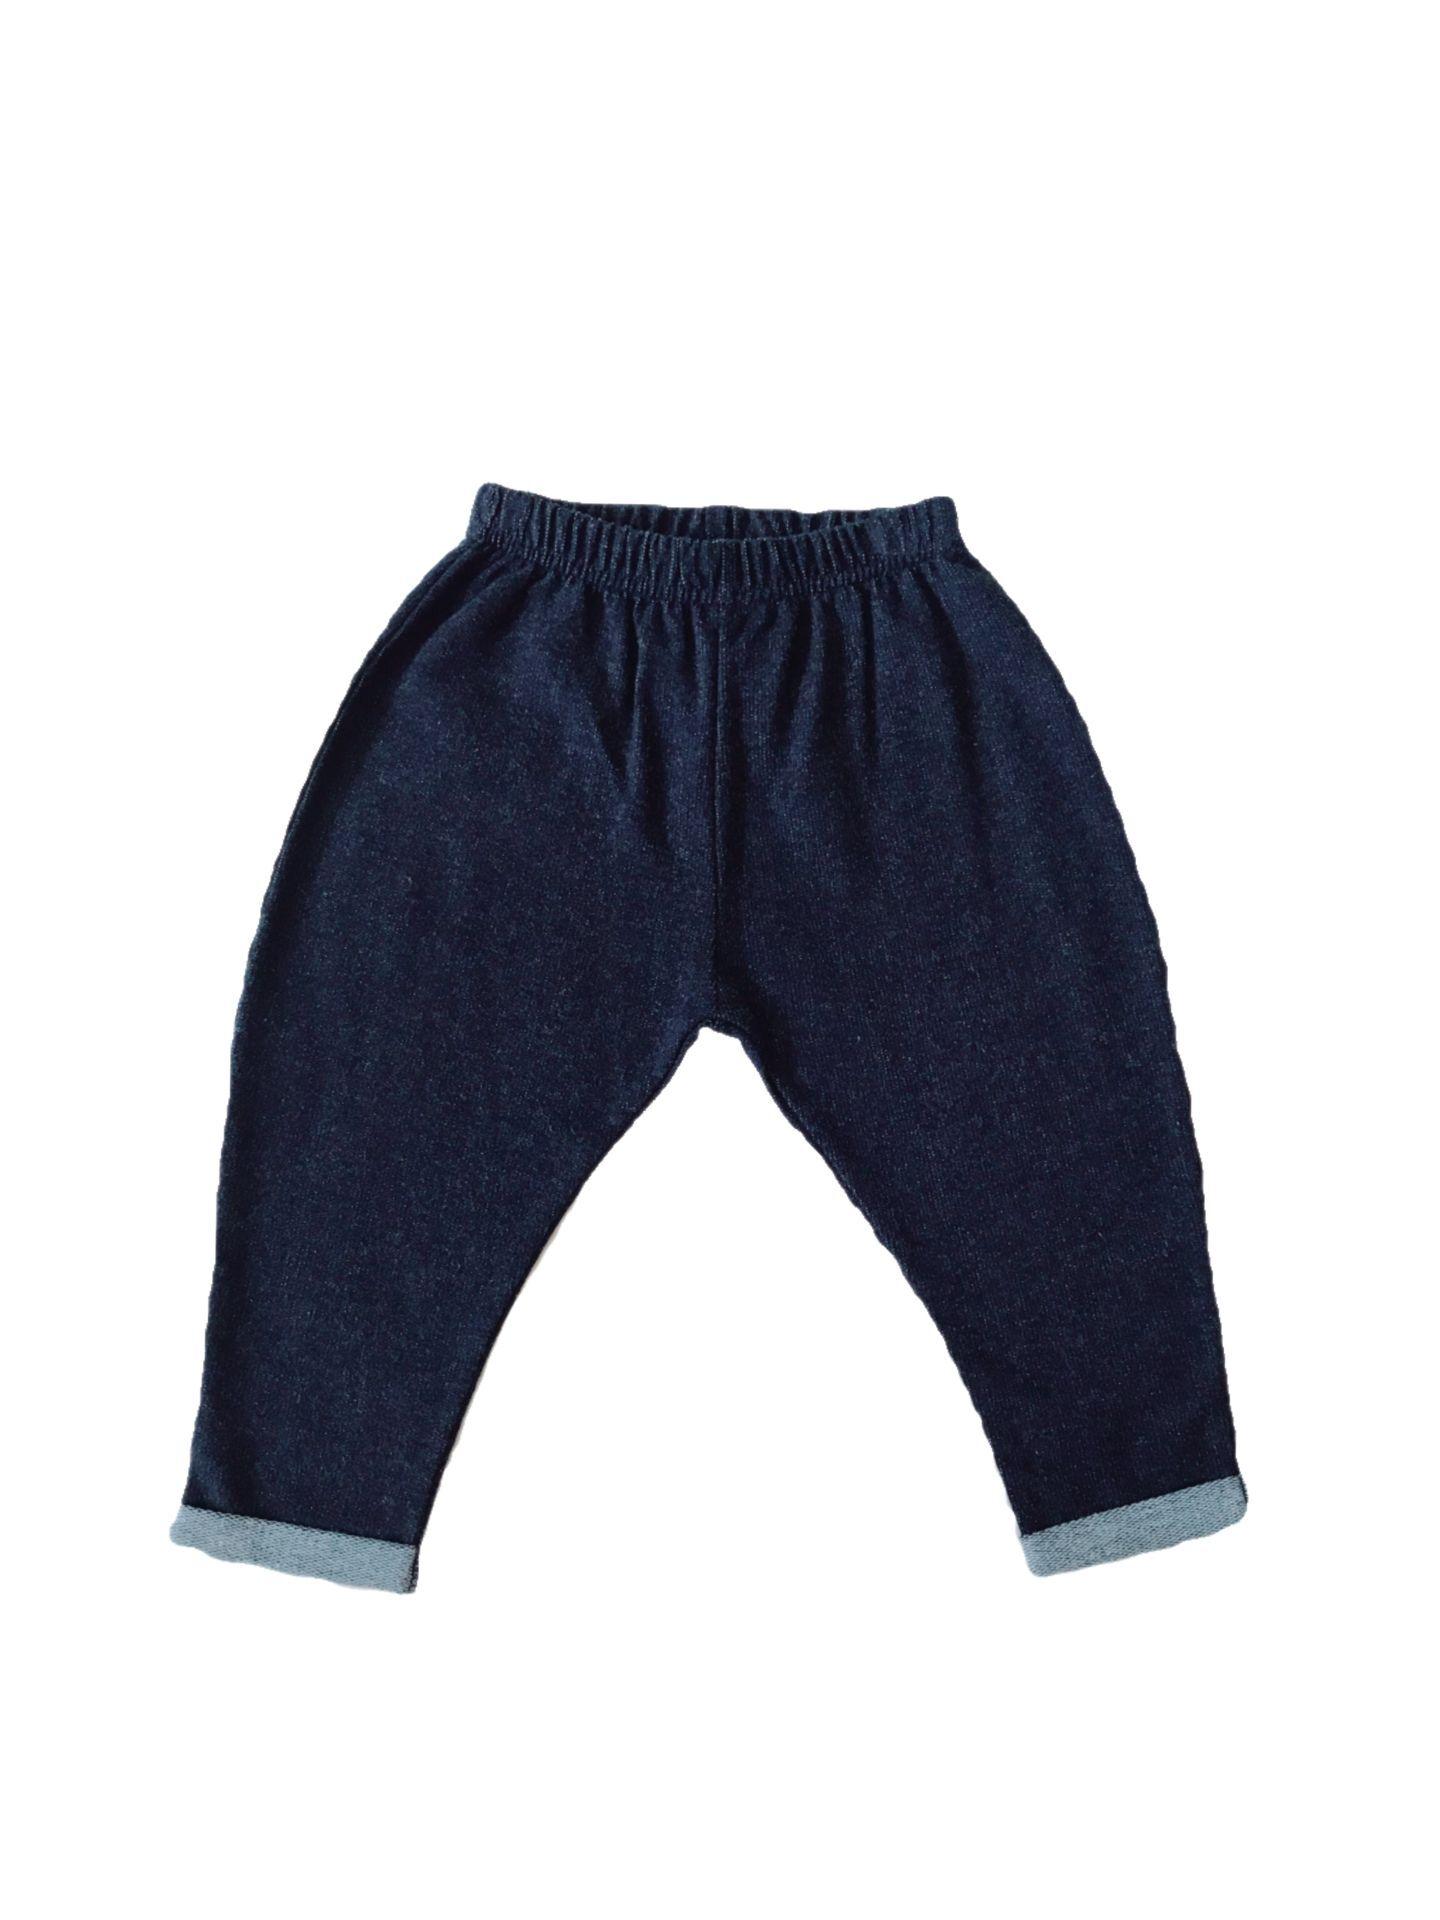 BABY DROP CROTCH DENIM TERRY PANTS